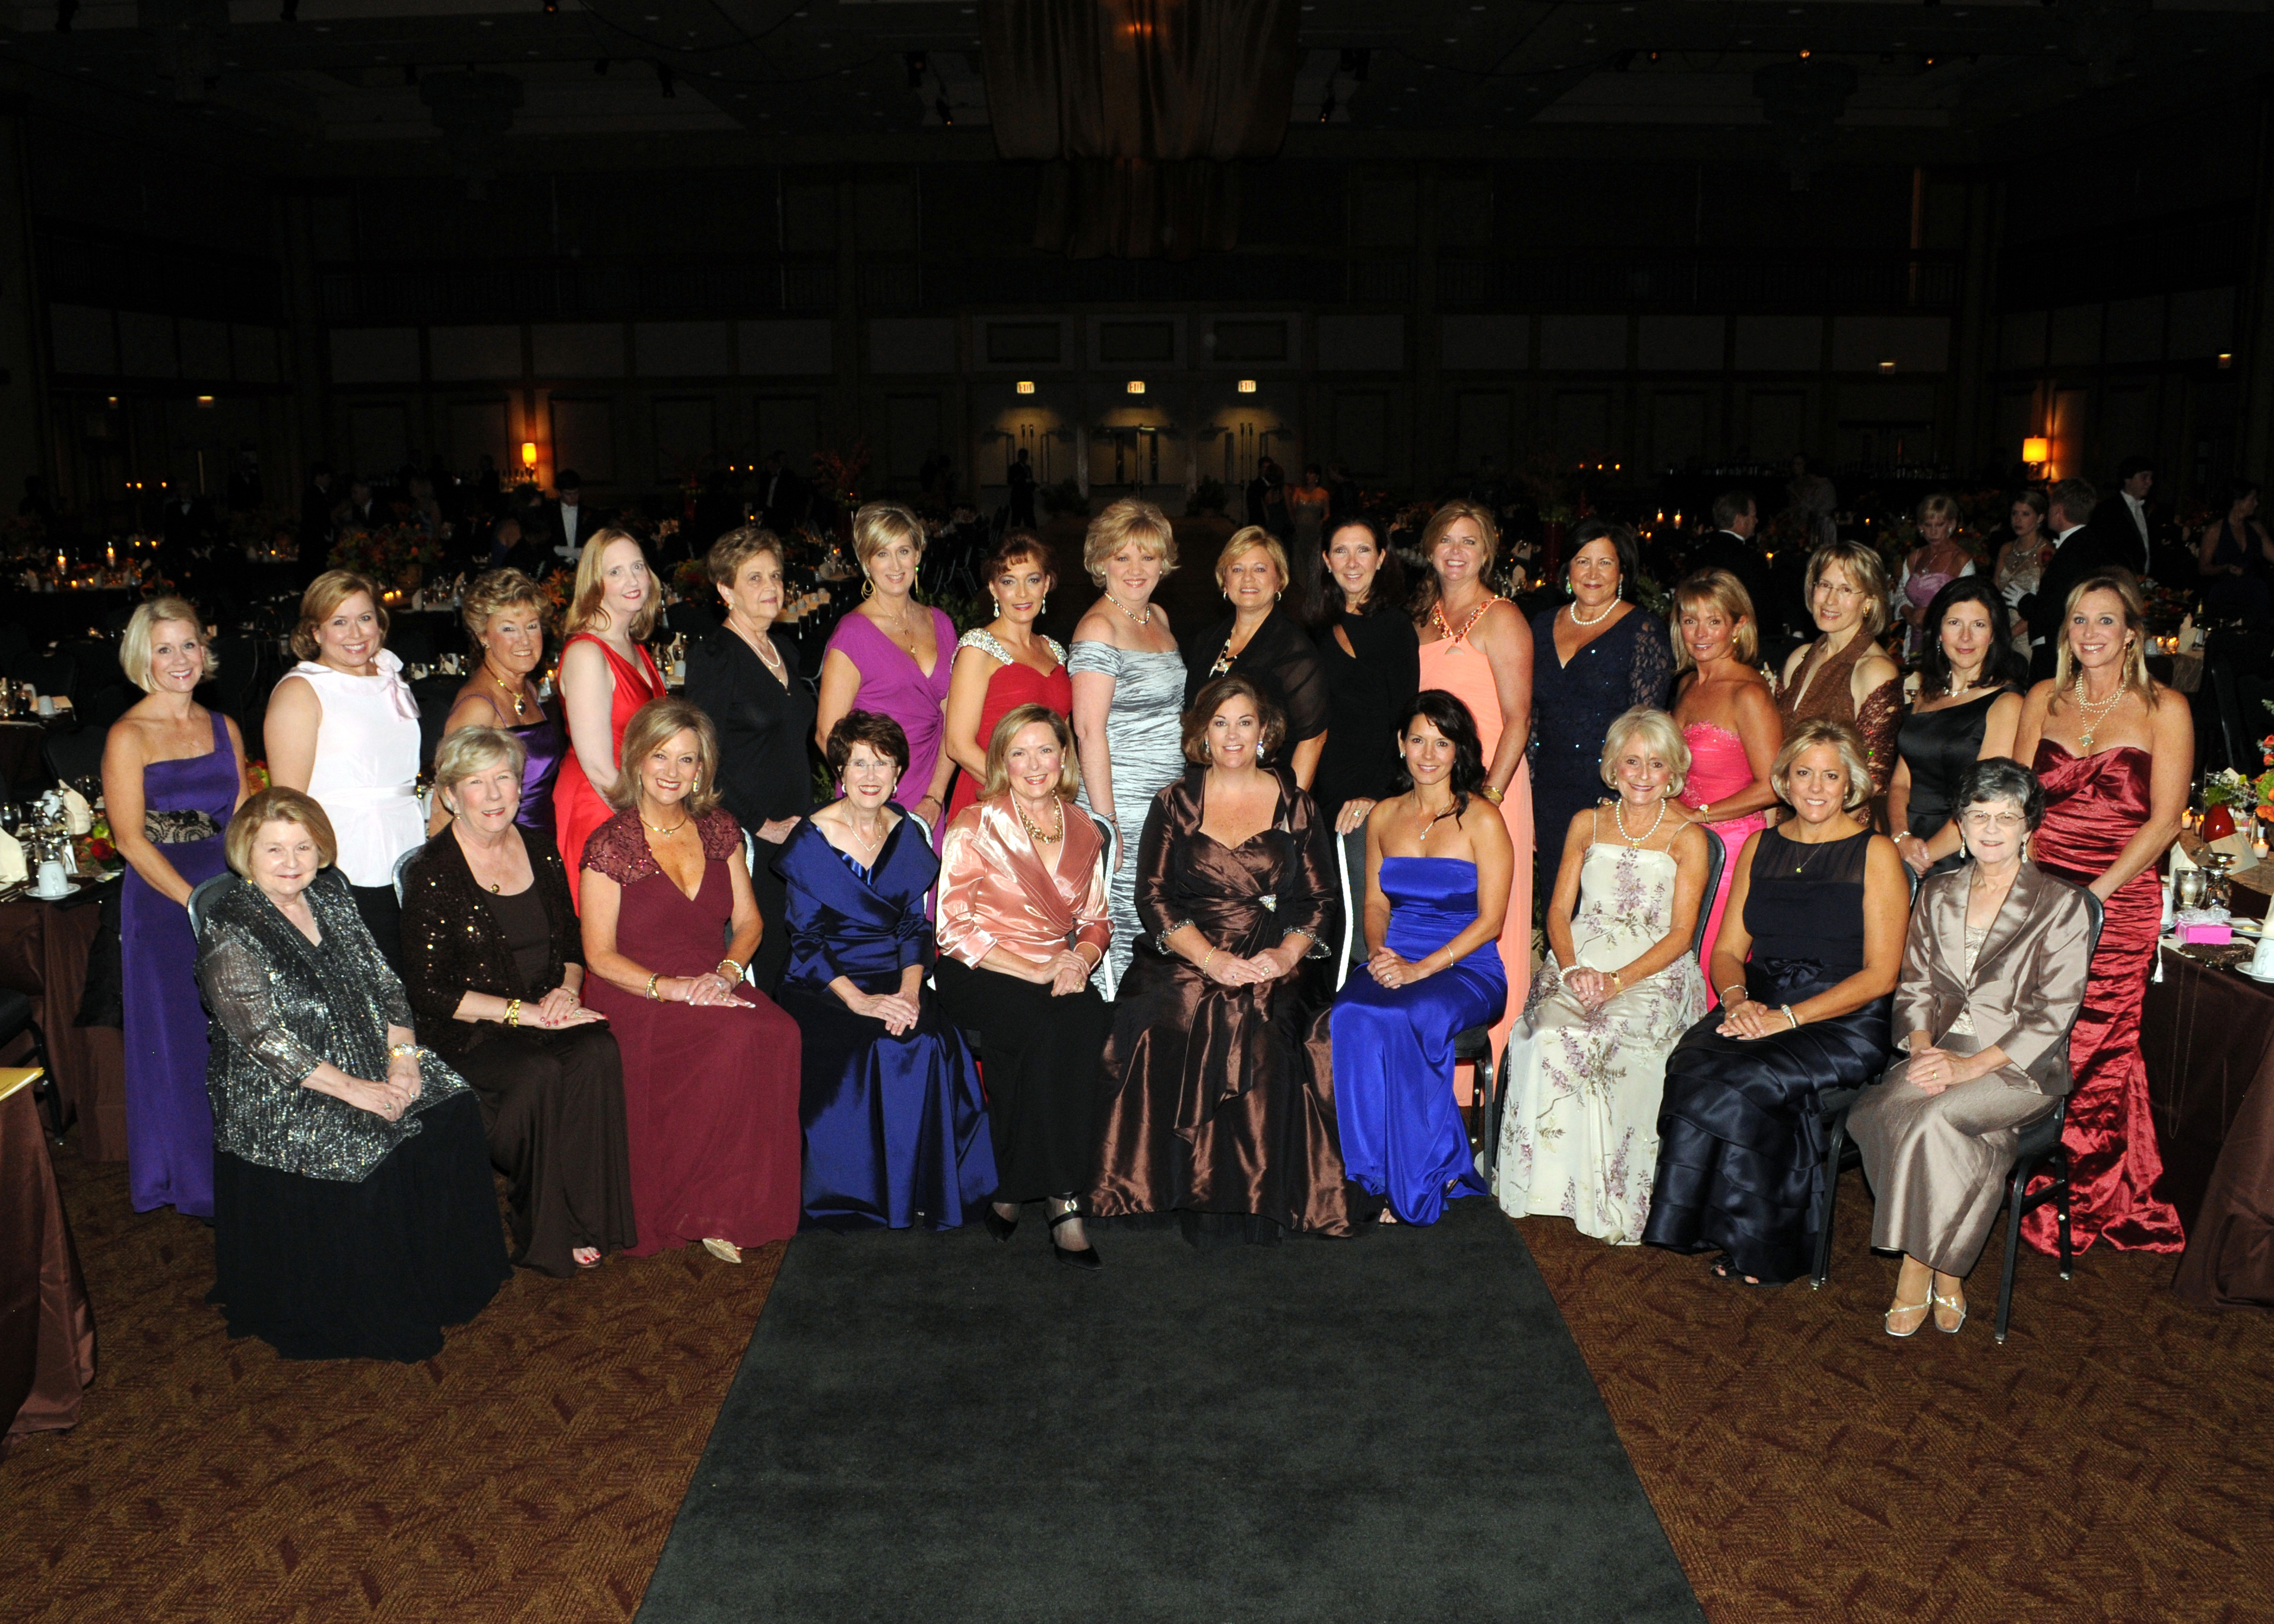 2013 HSOG Ball Committee